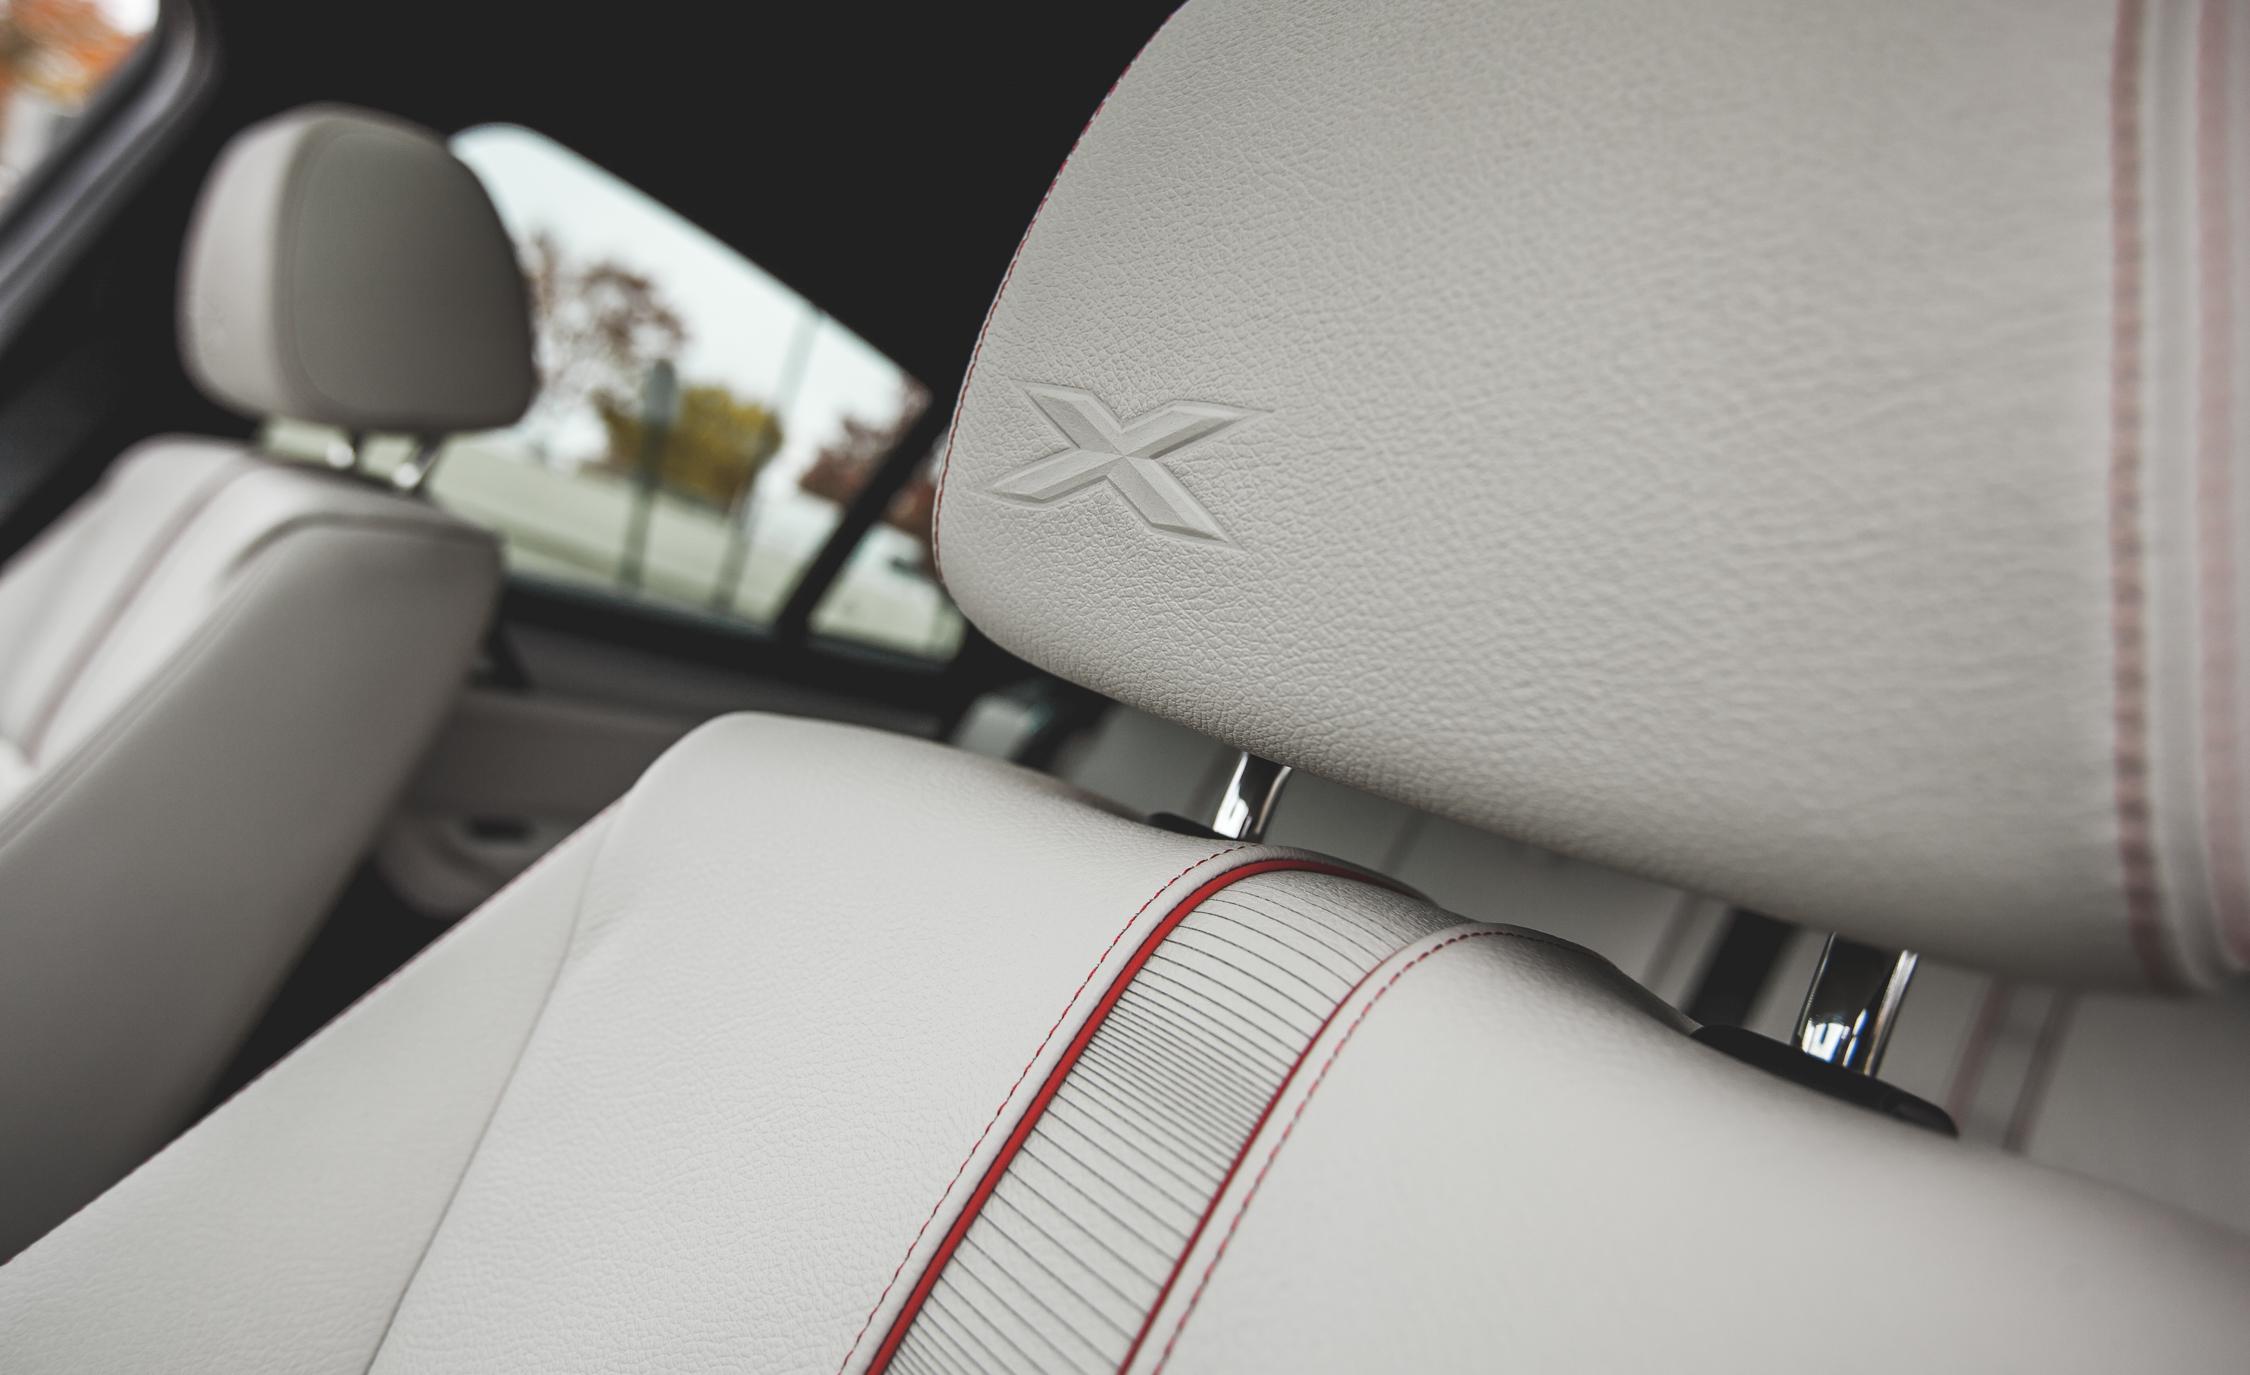 2015 BMW X4 XDrive28i Interior (Photo 12 of 29)